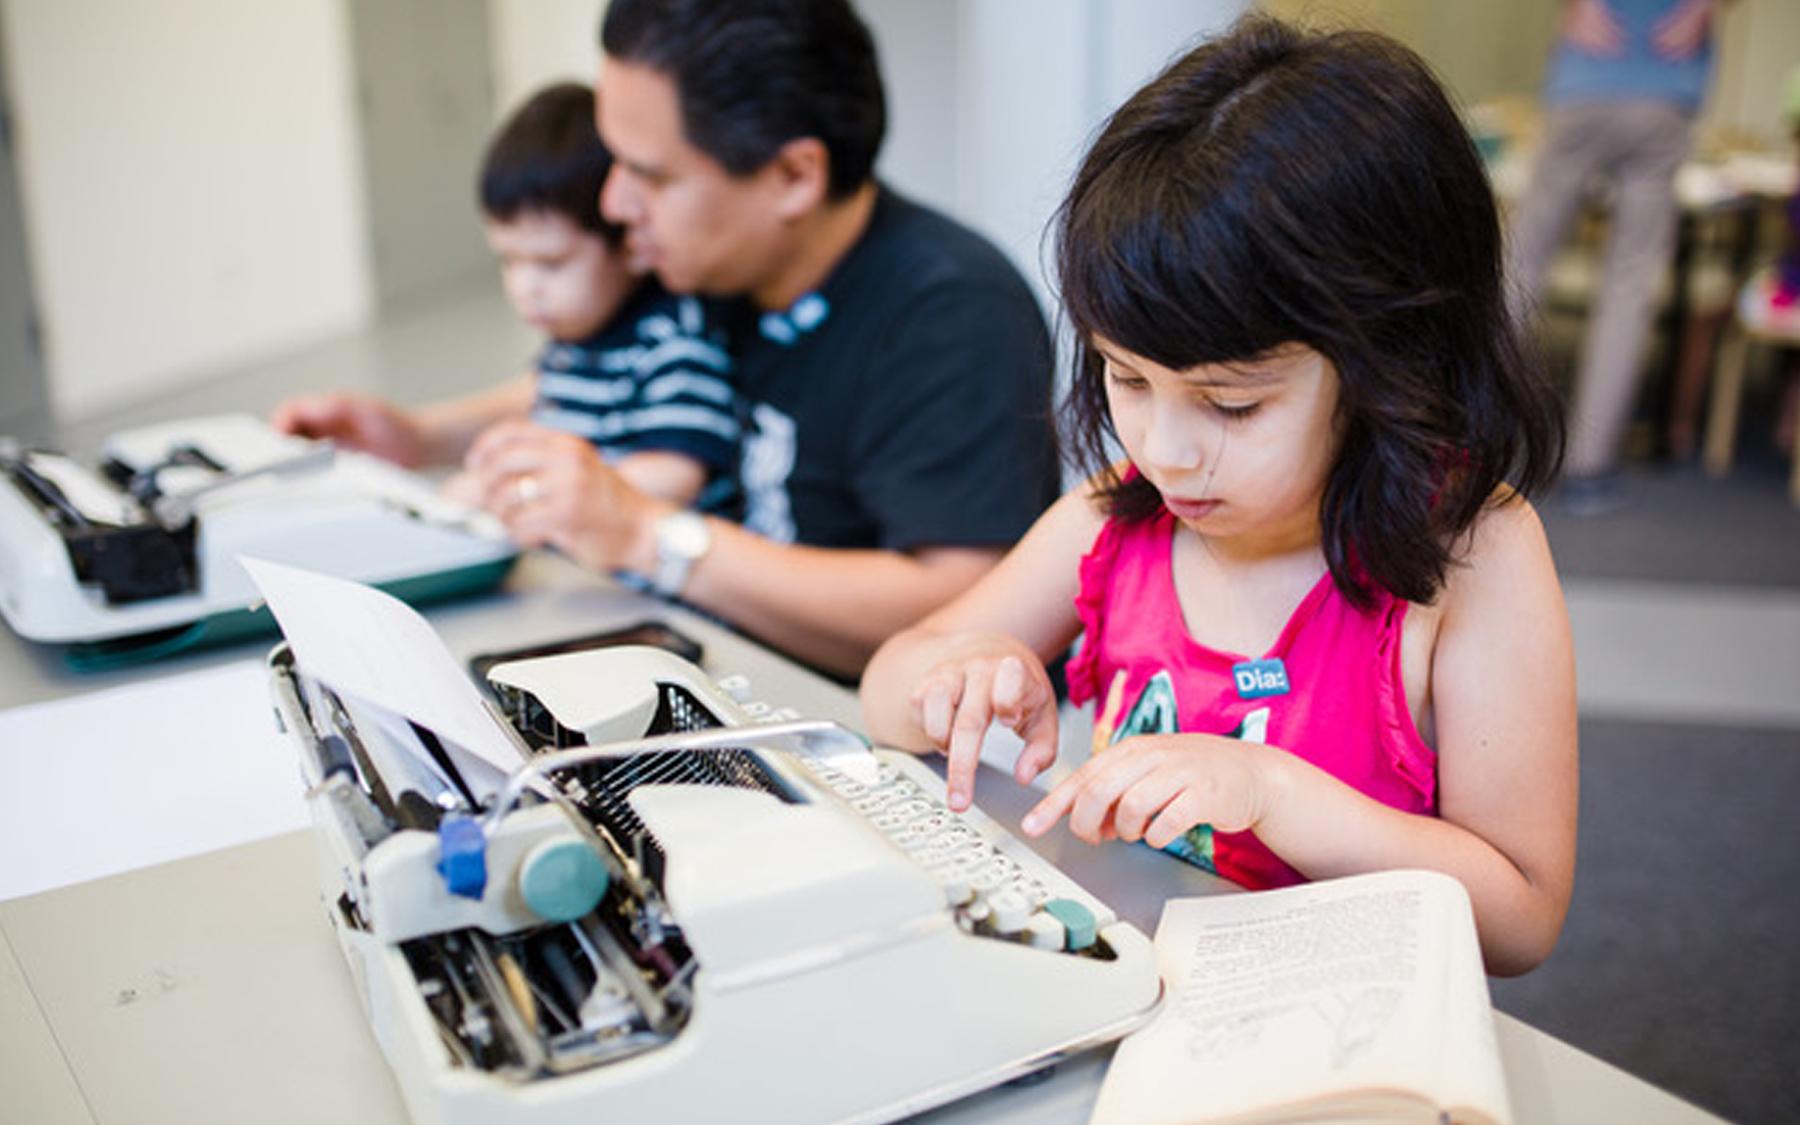 Children sitting at typewriters.